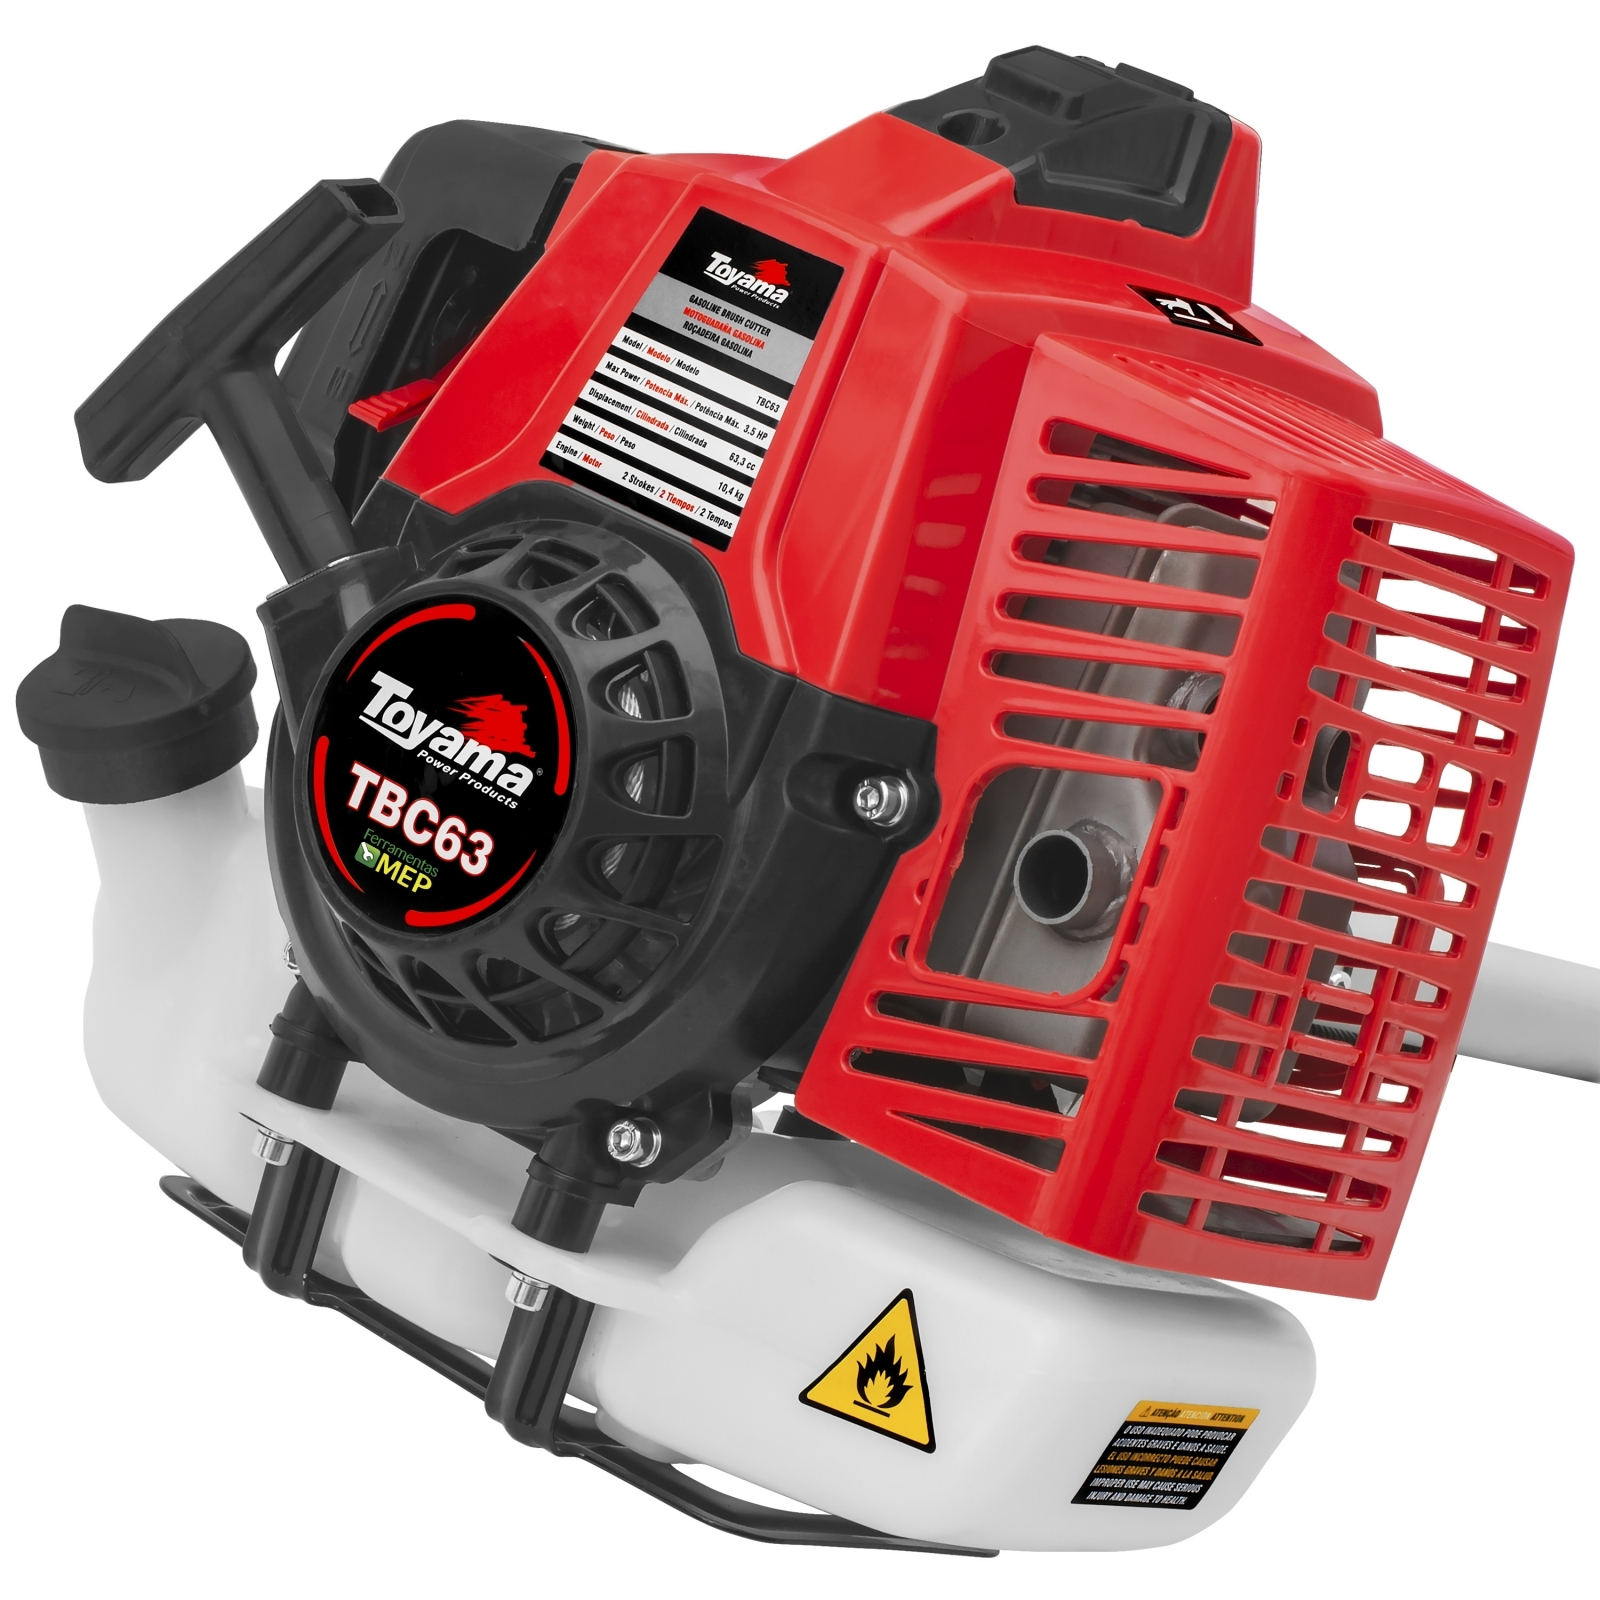 Roçadeira Gasolina Profissional Lateral Toyama TBC63 - Ferramentas MEP